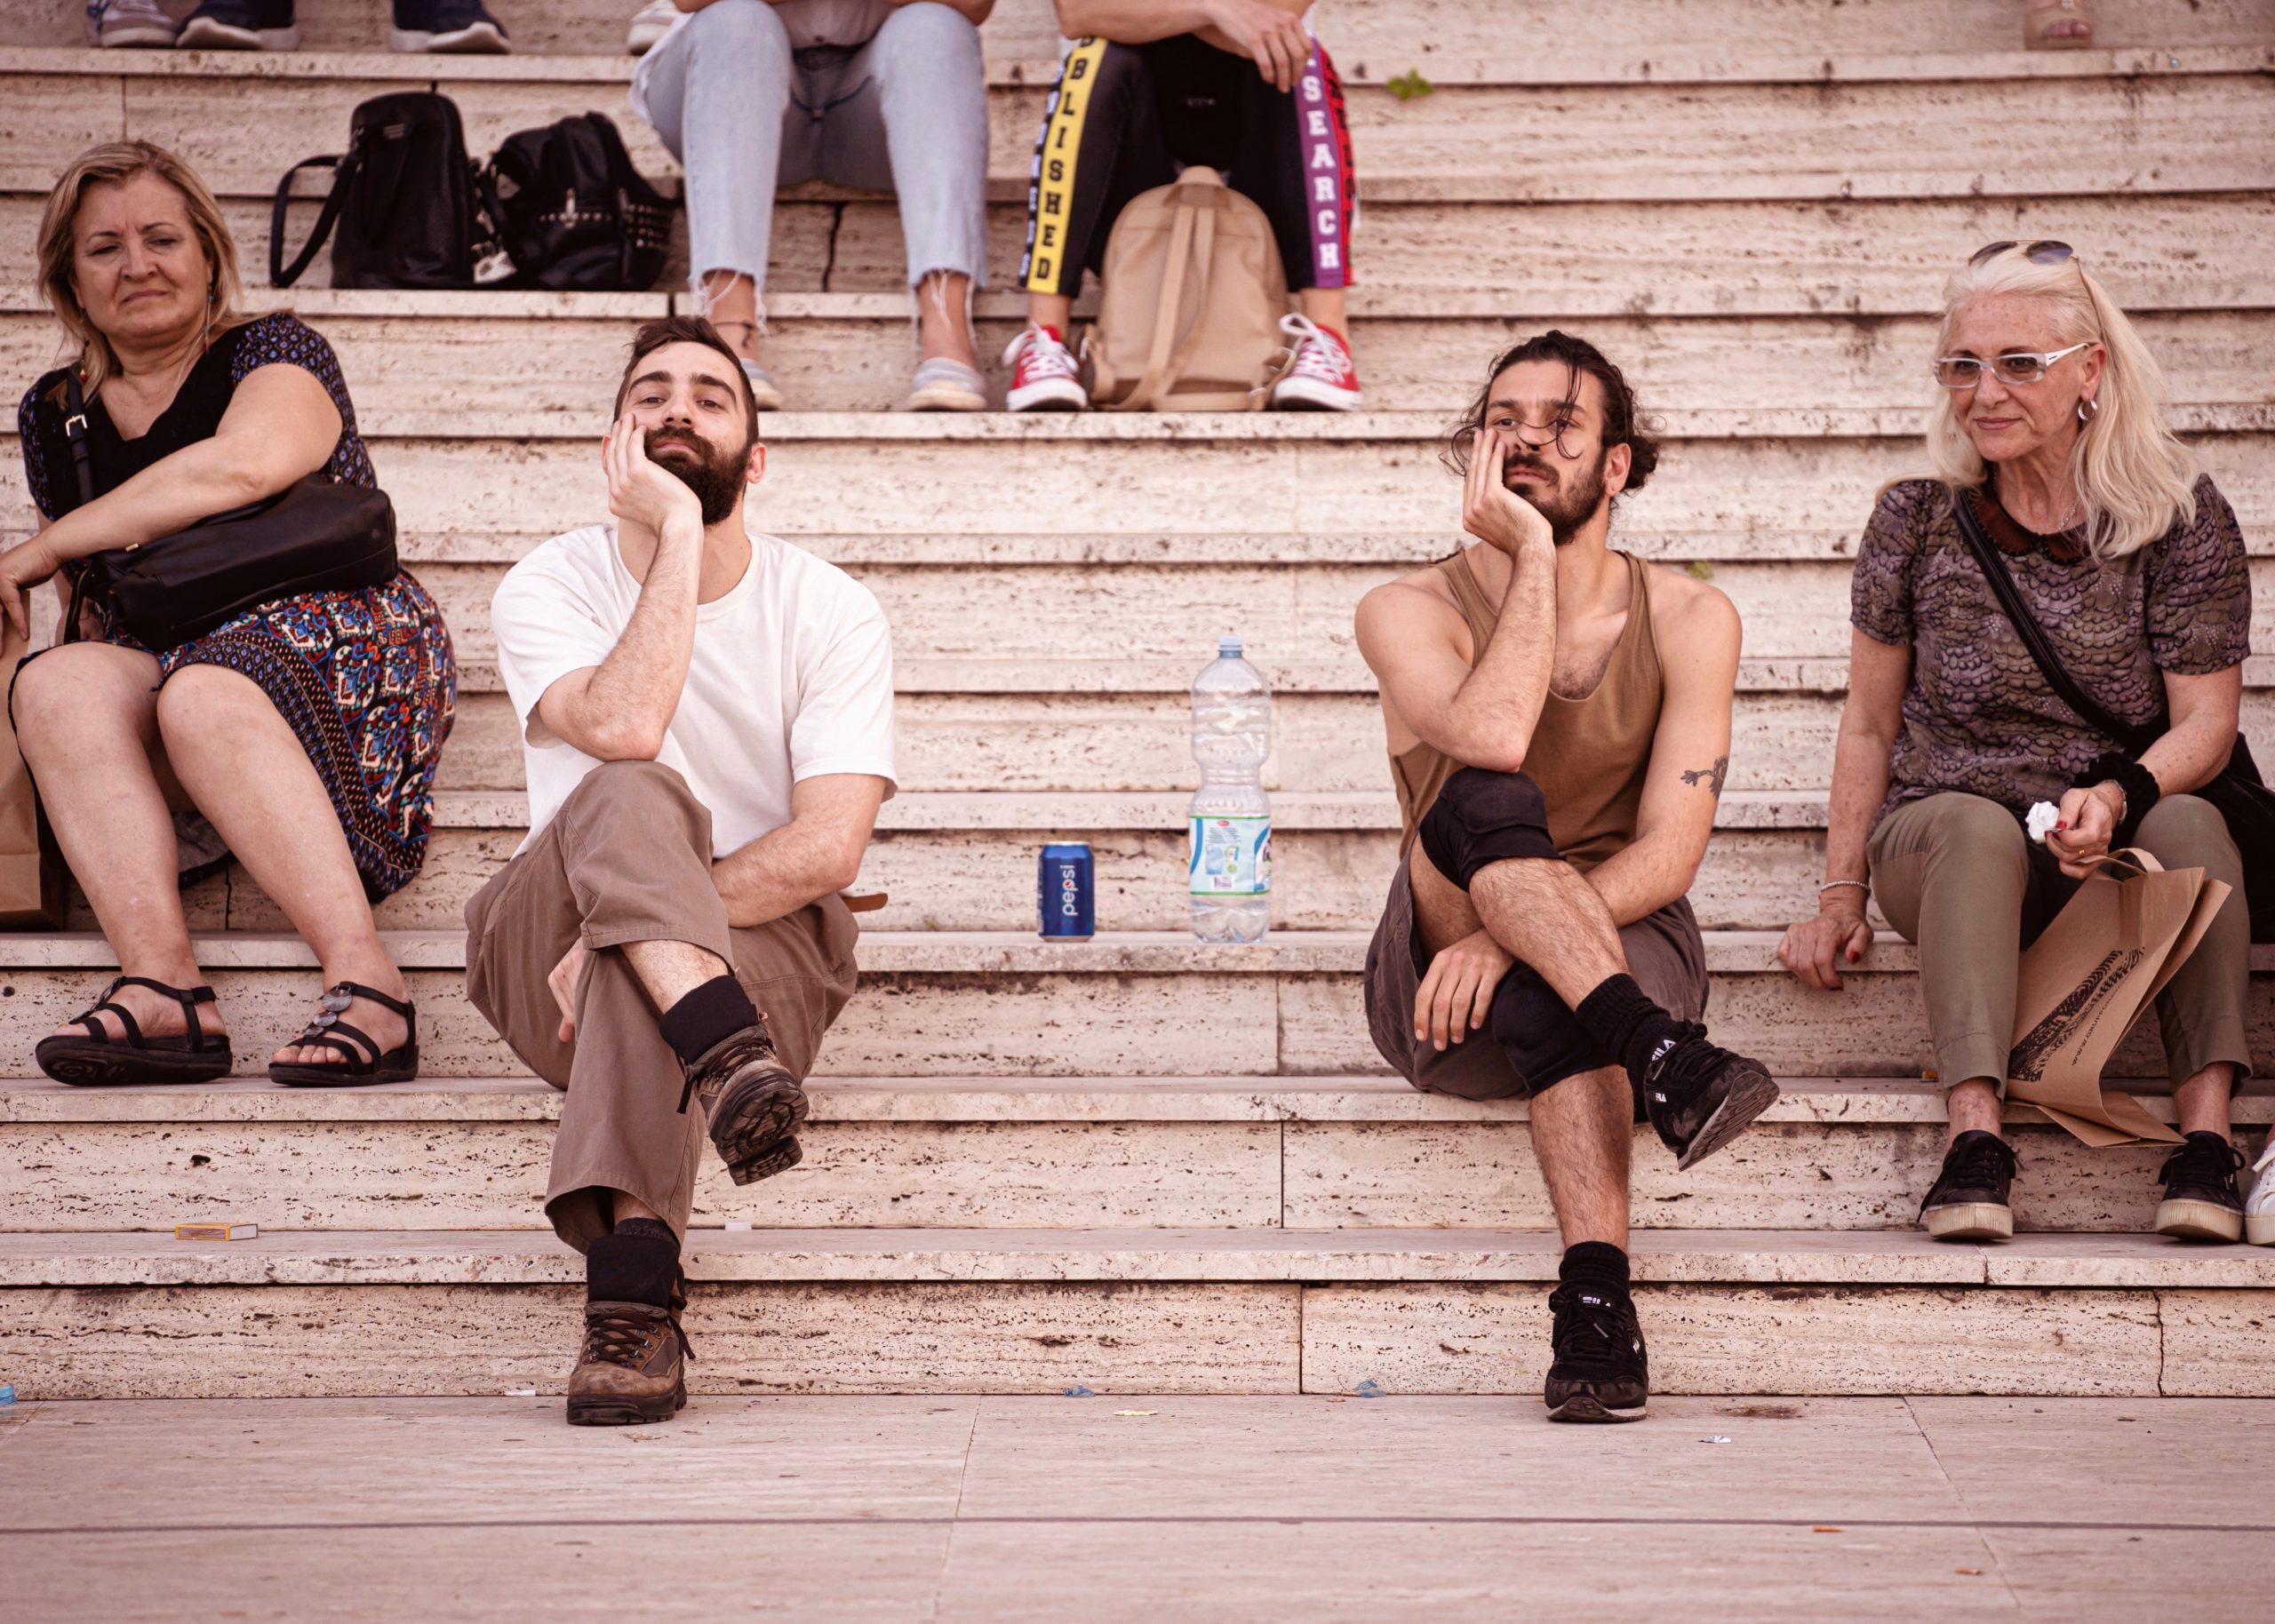 Ammutinamenti – Festival di danza urbana e d'autore 2020